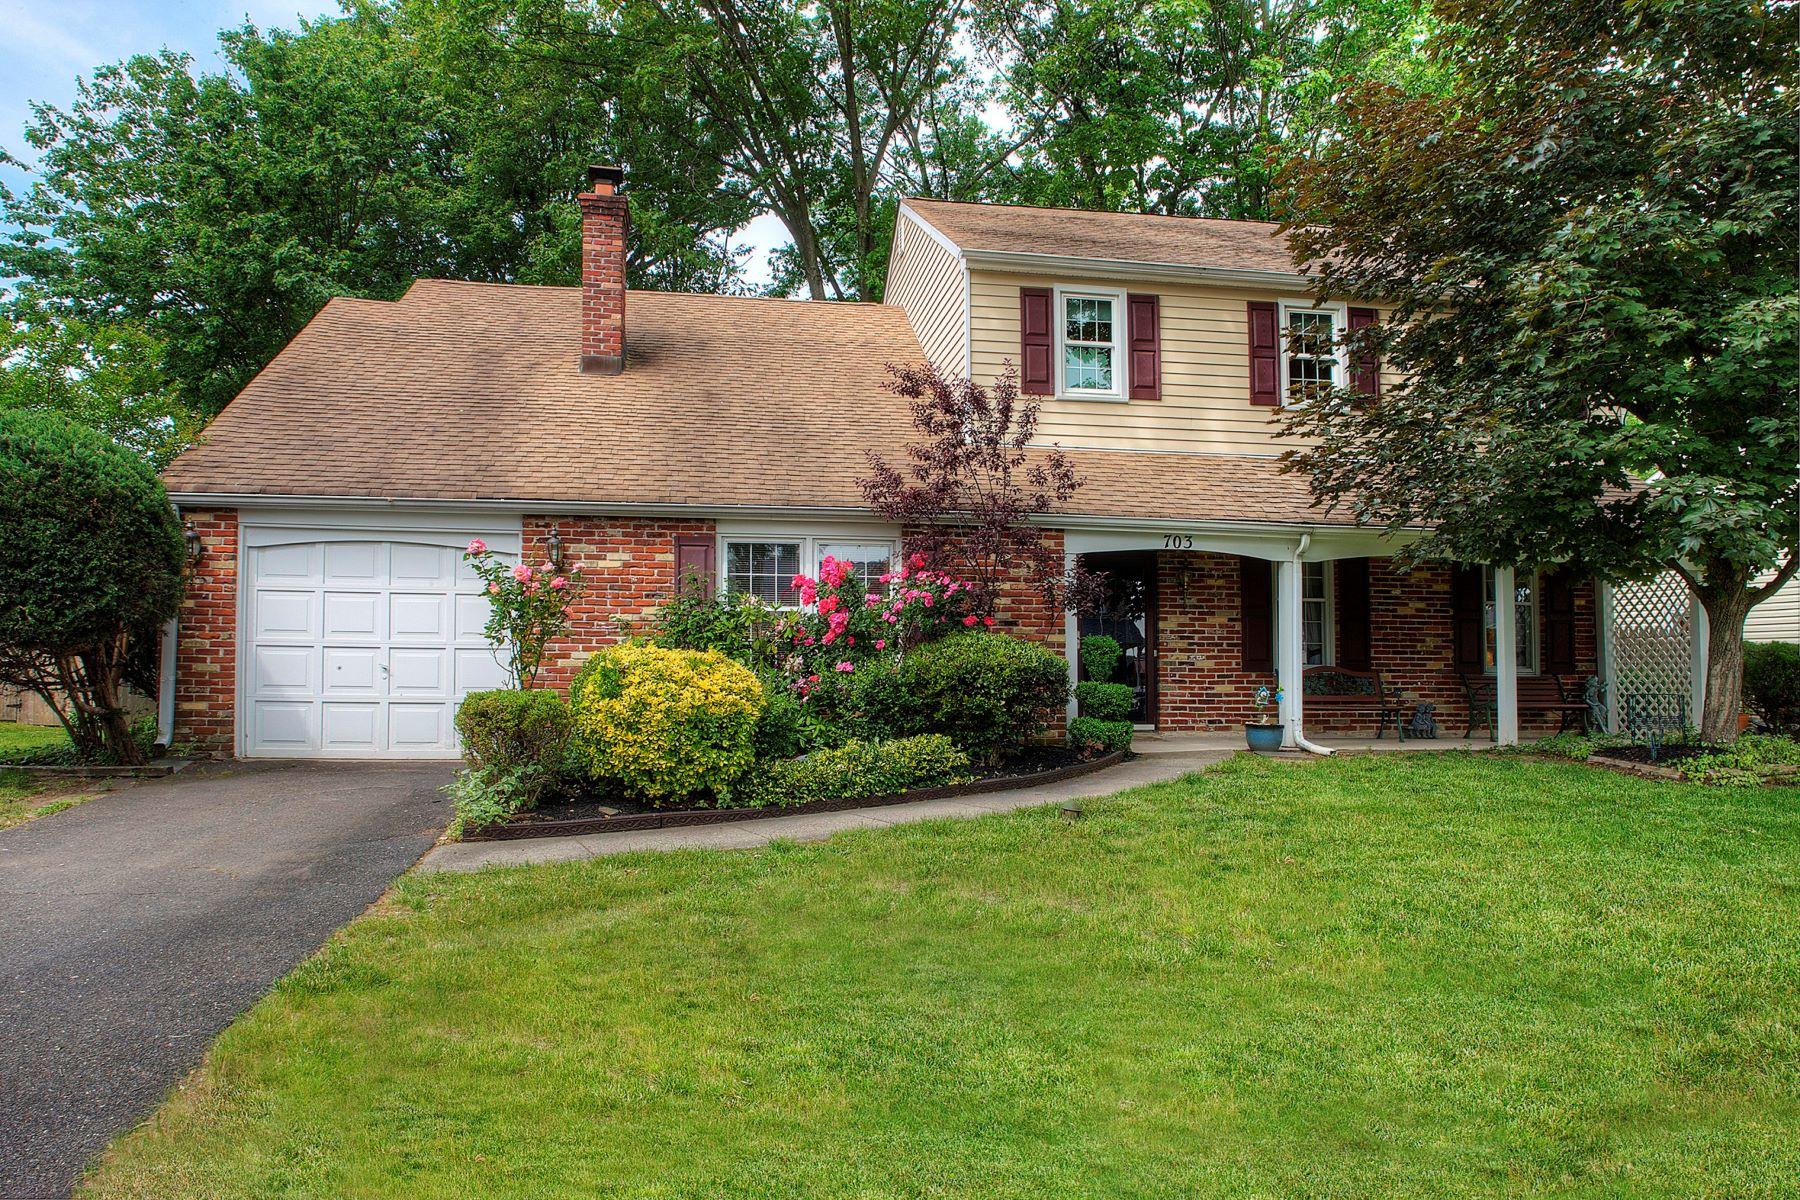 Single Family Homes for Sale at 703 FAIRBRIDGE DR Fairless Hills, Pennsylvania 19030 United States